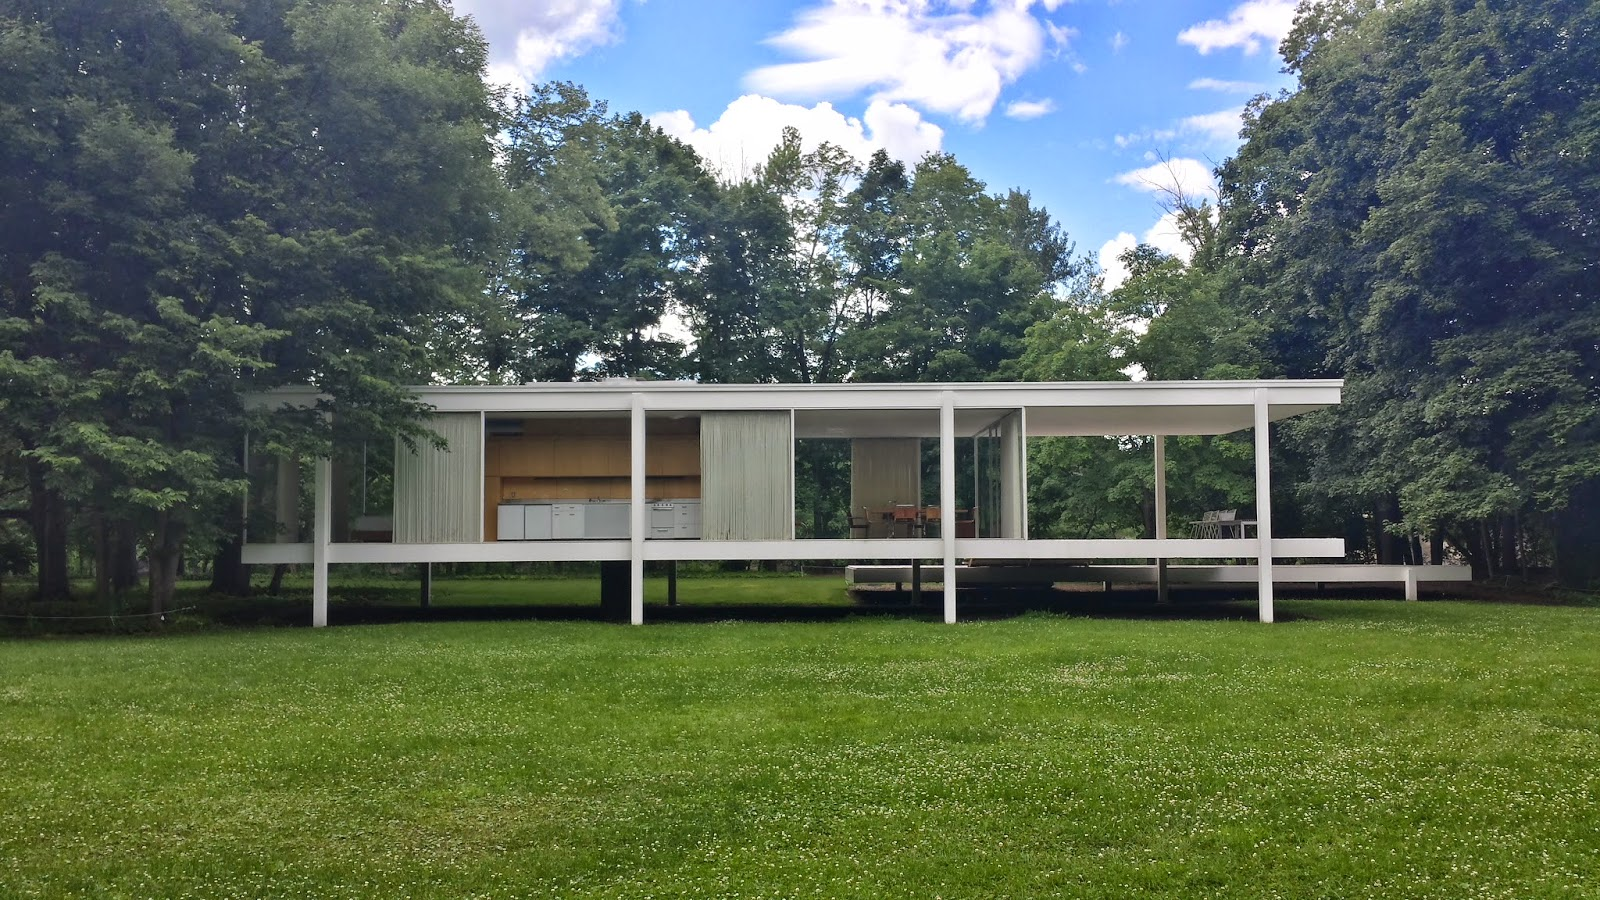 housing and architecture 4 farnsworth house mies van der rohe luan vinicius. Black Bedroom Furniture Sets. Home Design Ideas